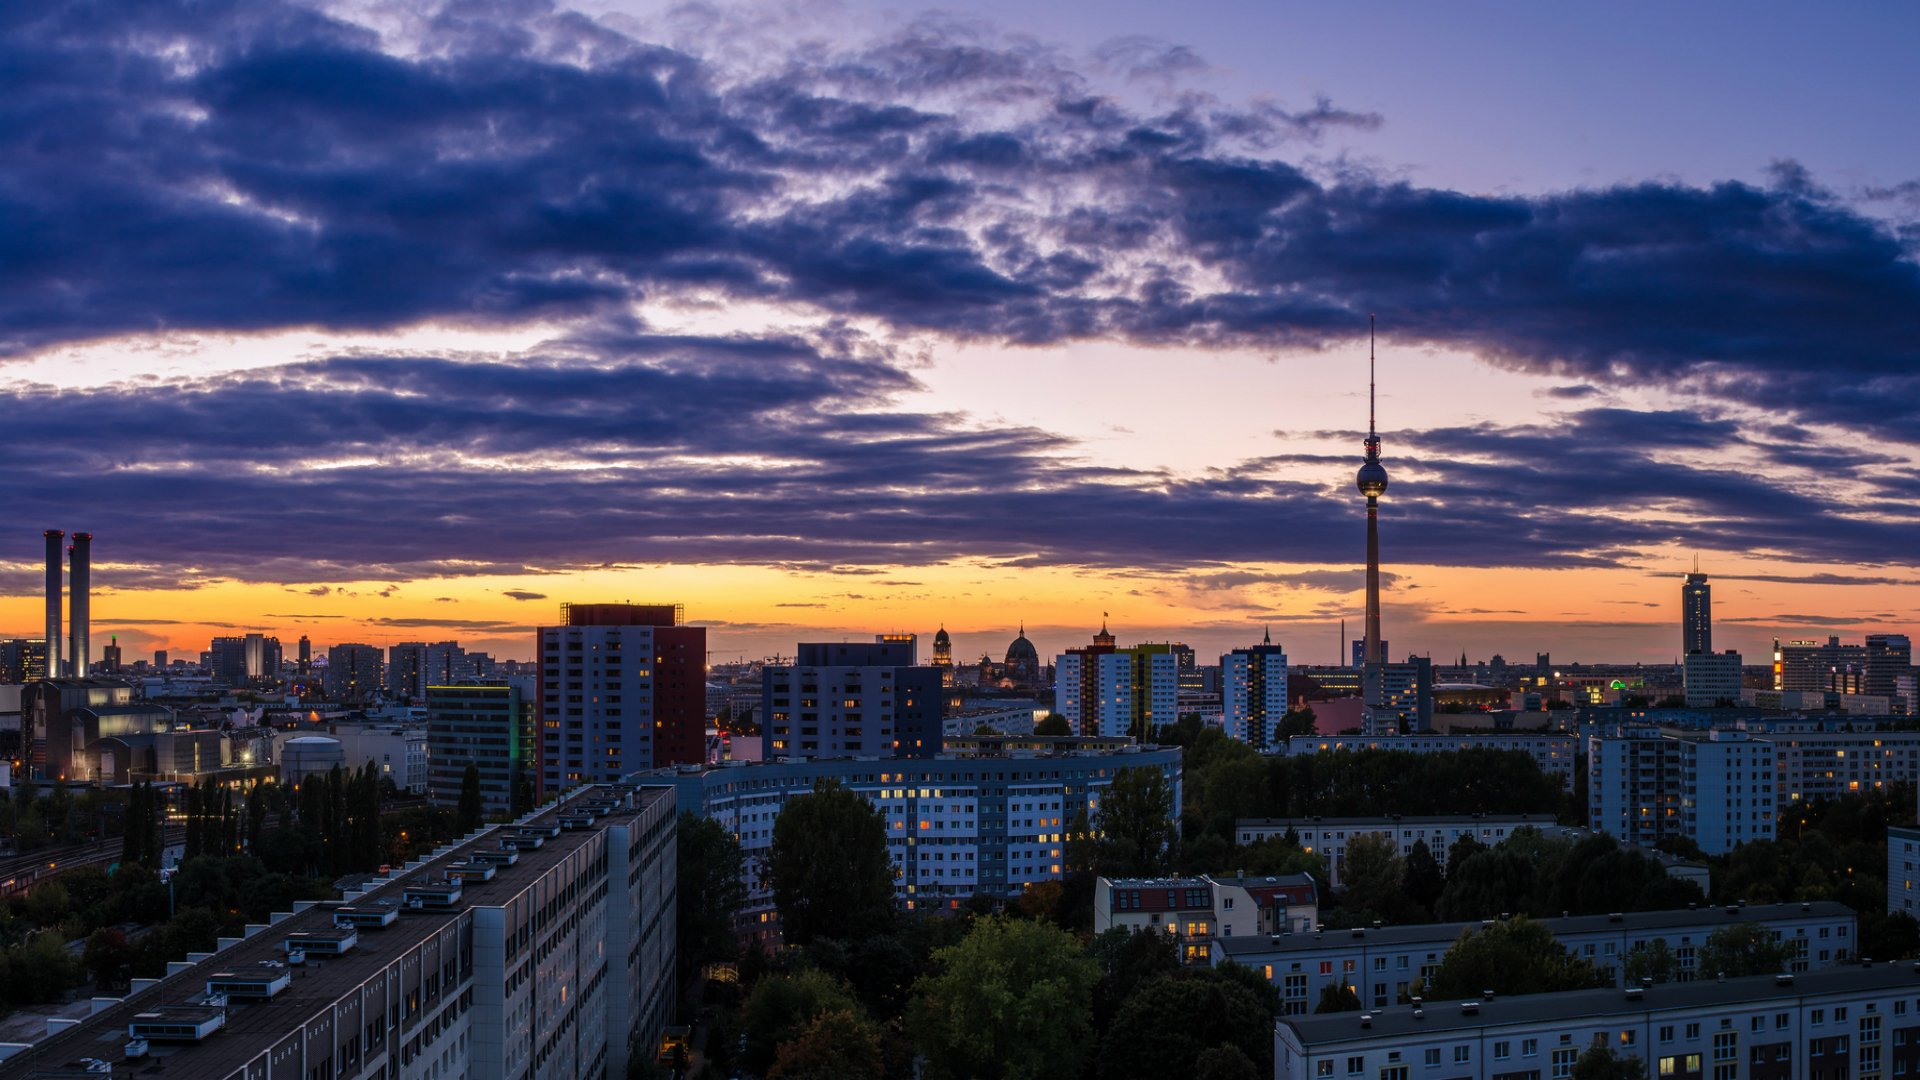 Berlin Background Wallpaper